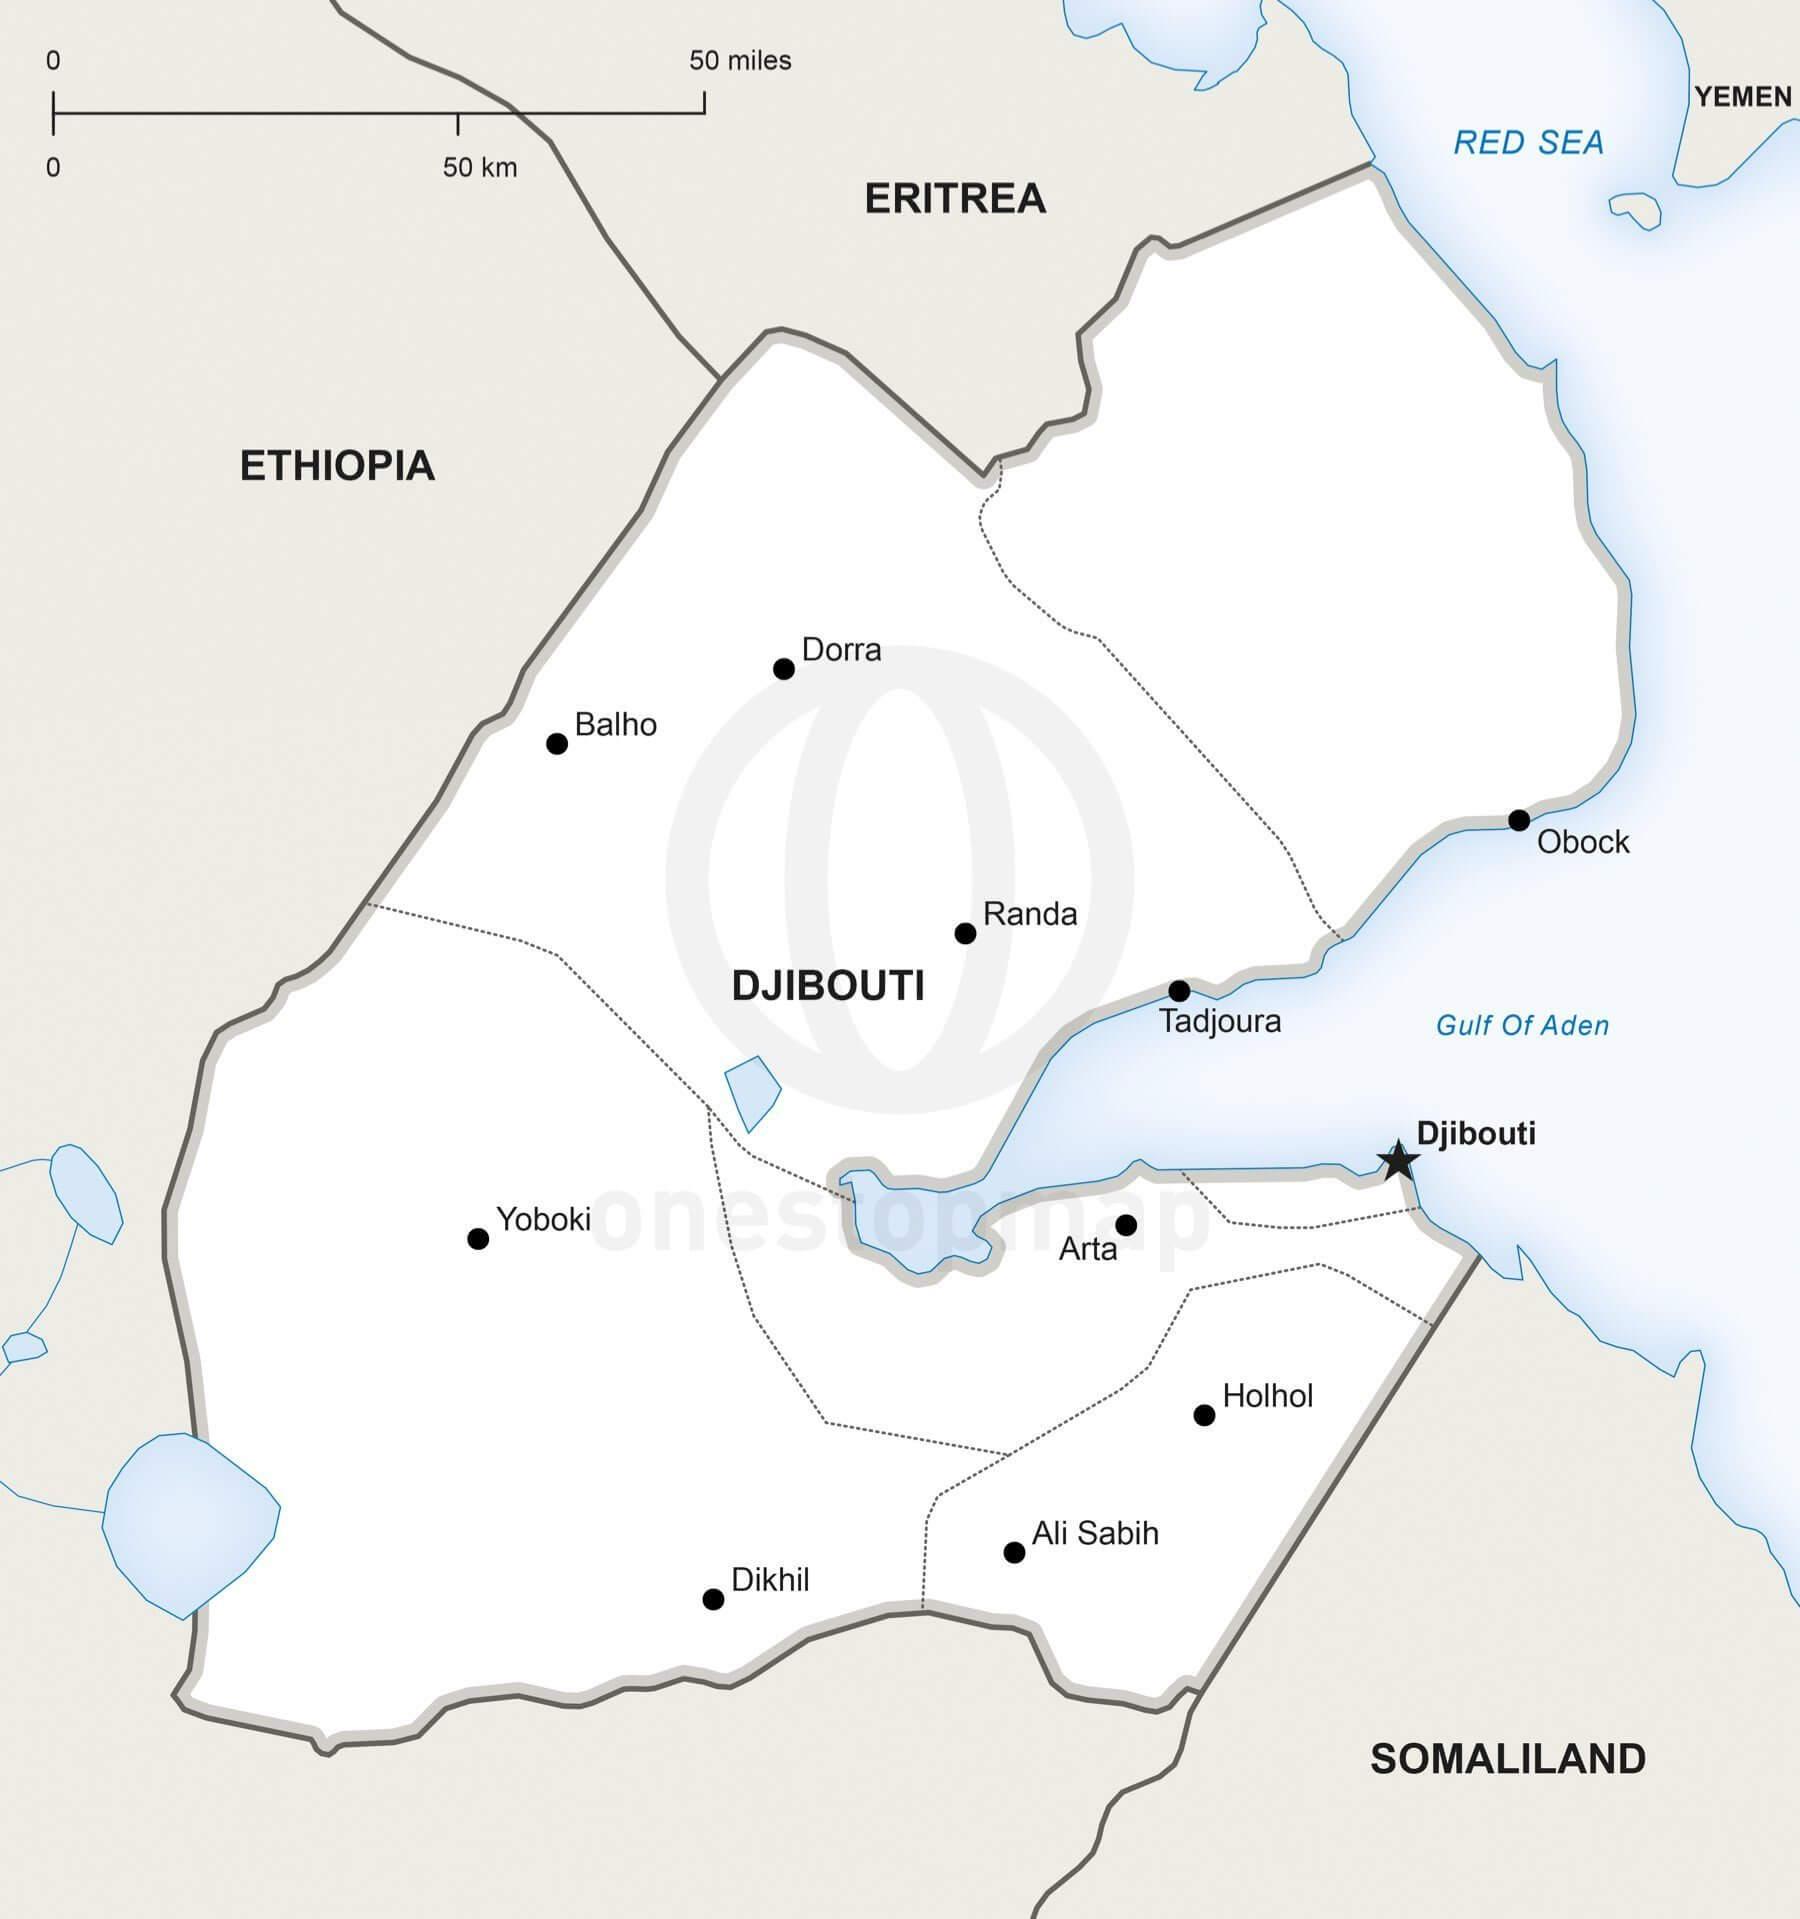 Map of Djibouti political